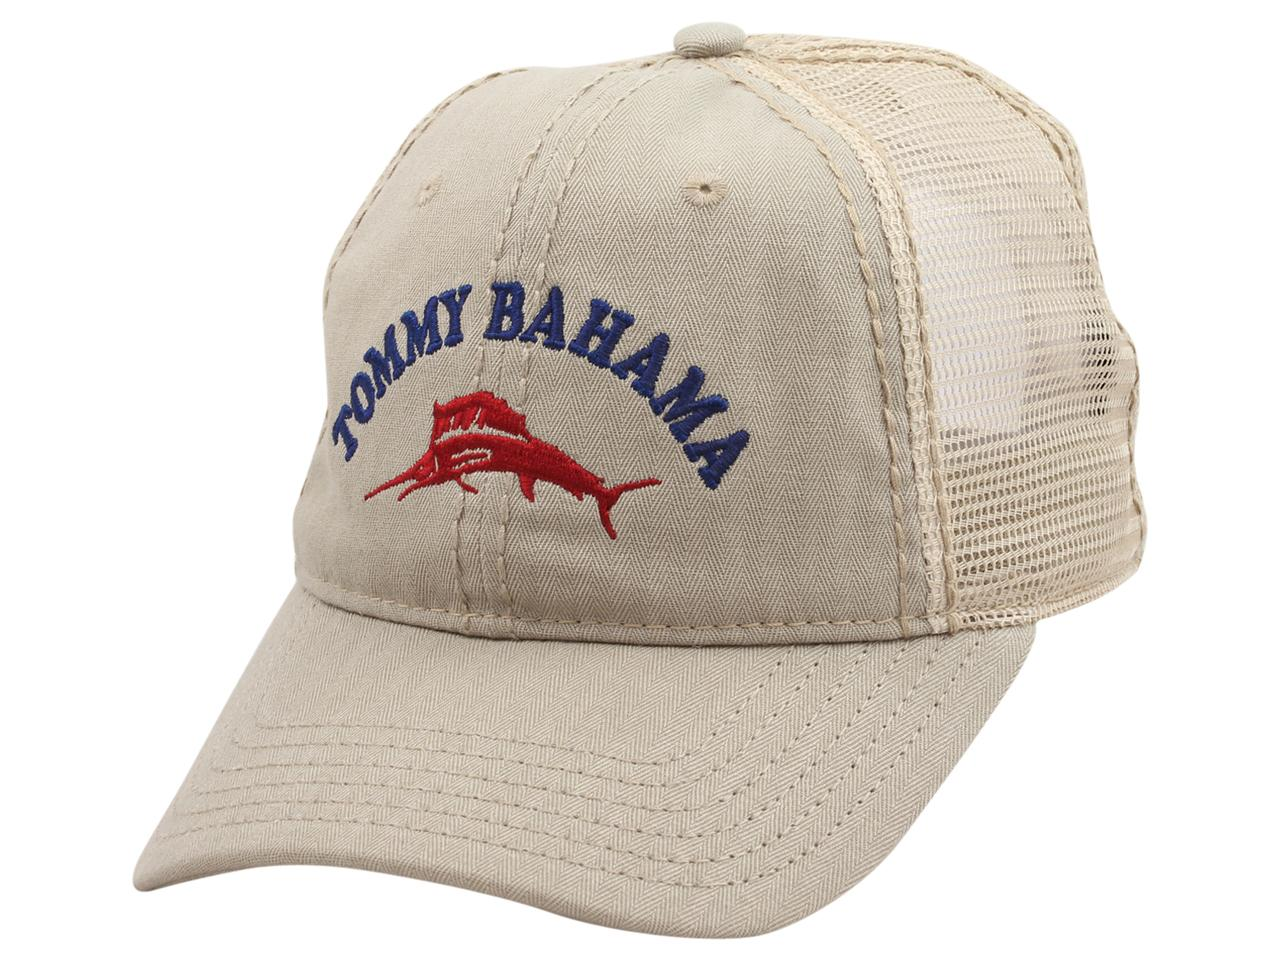 Image of Tommy Bahama Men's Strapback Trucker Cap Baseball Hat - Khaki - One Size Fits Most